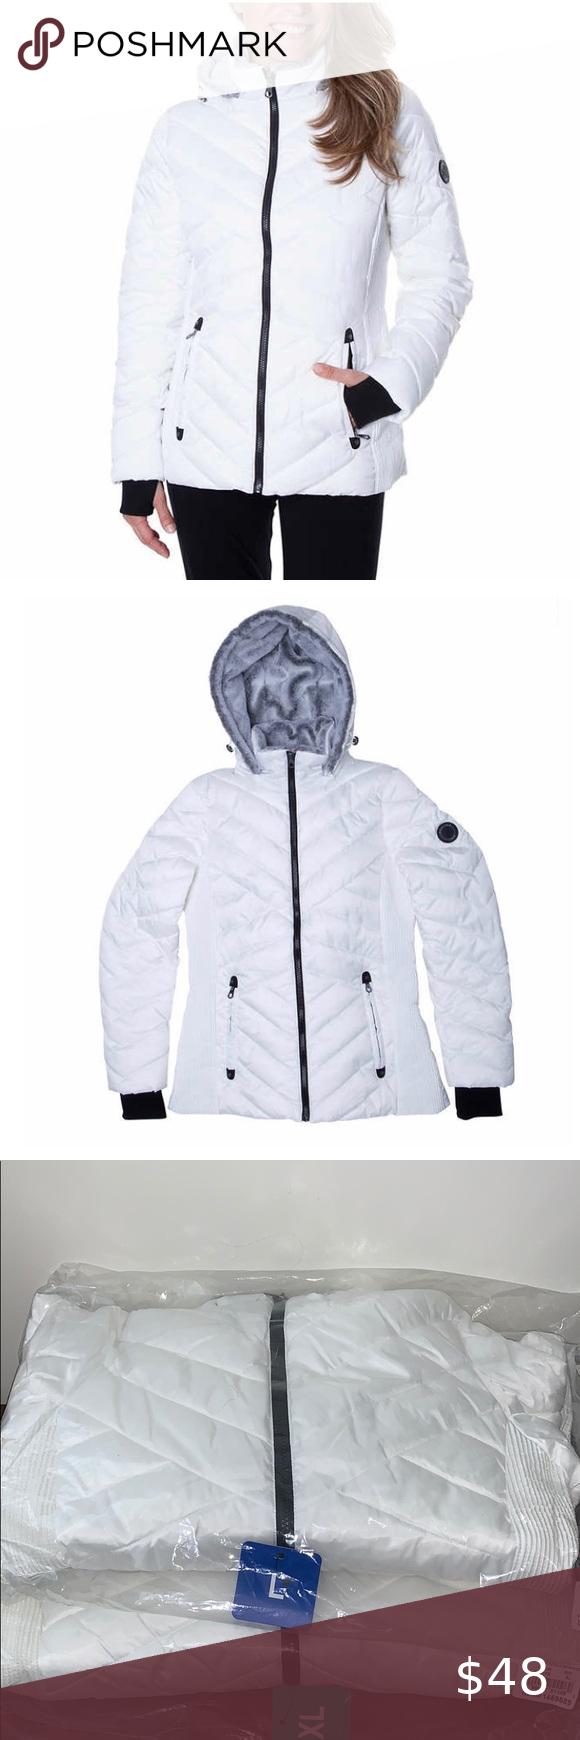 Nautica Ladies Hooded Puffer Jacket White Puffer Jacket Women Faux Fur Hooded Coat Coats Jackets Women [ 1740 x 580 Pixel ]